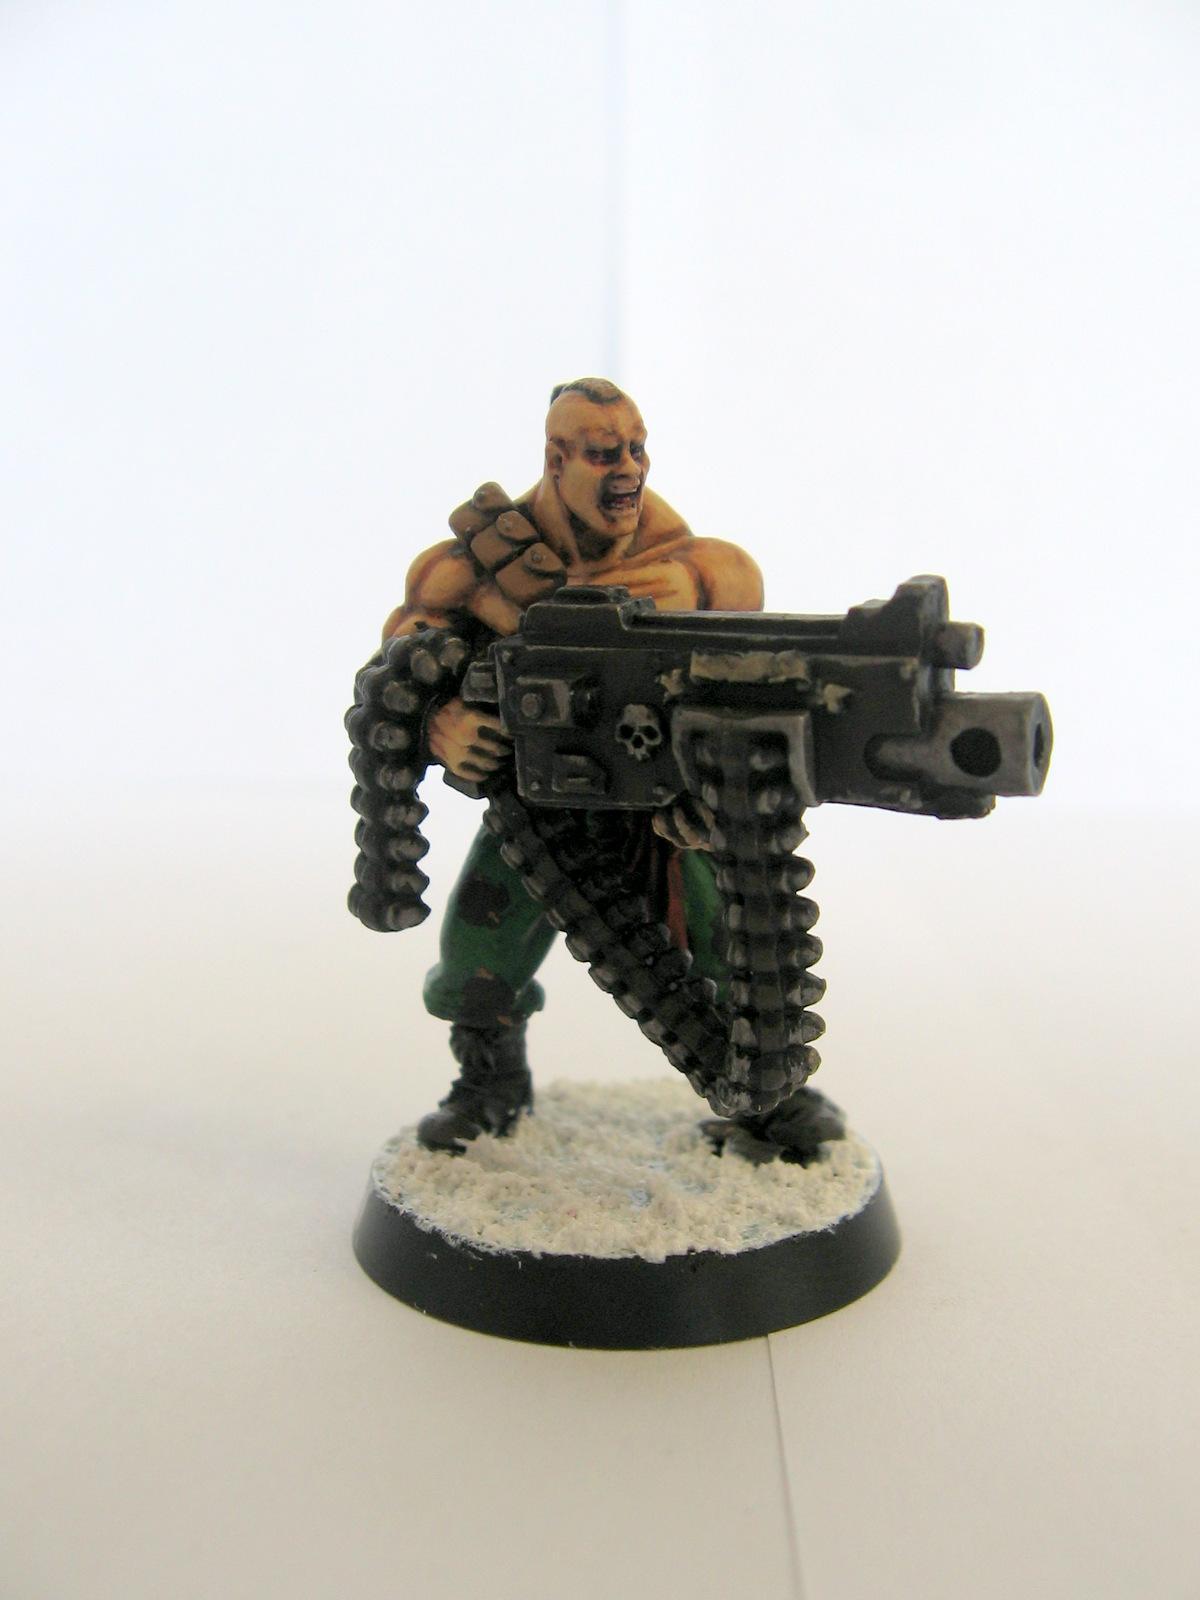 Catachan, Harker, Imperial Guard, Warhammer 40,000